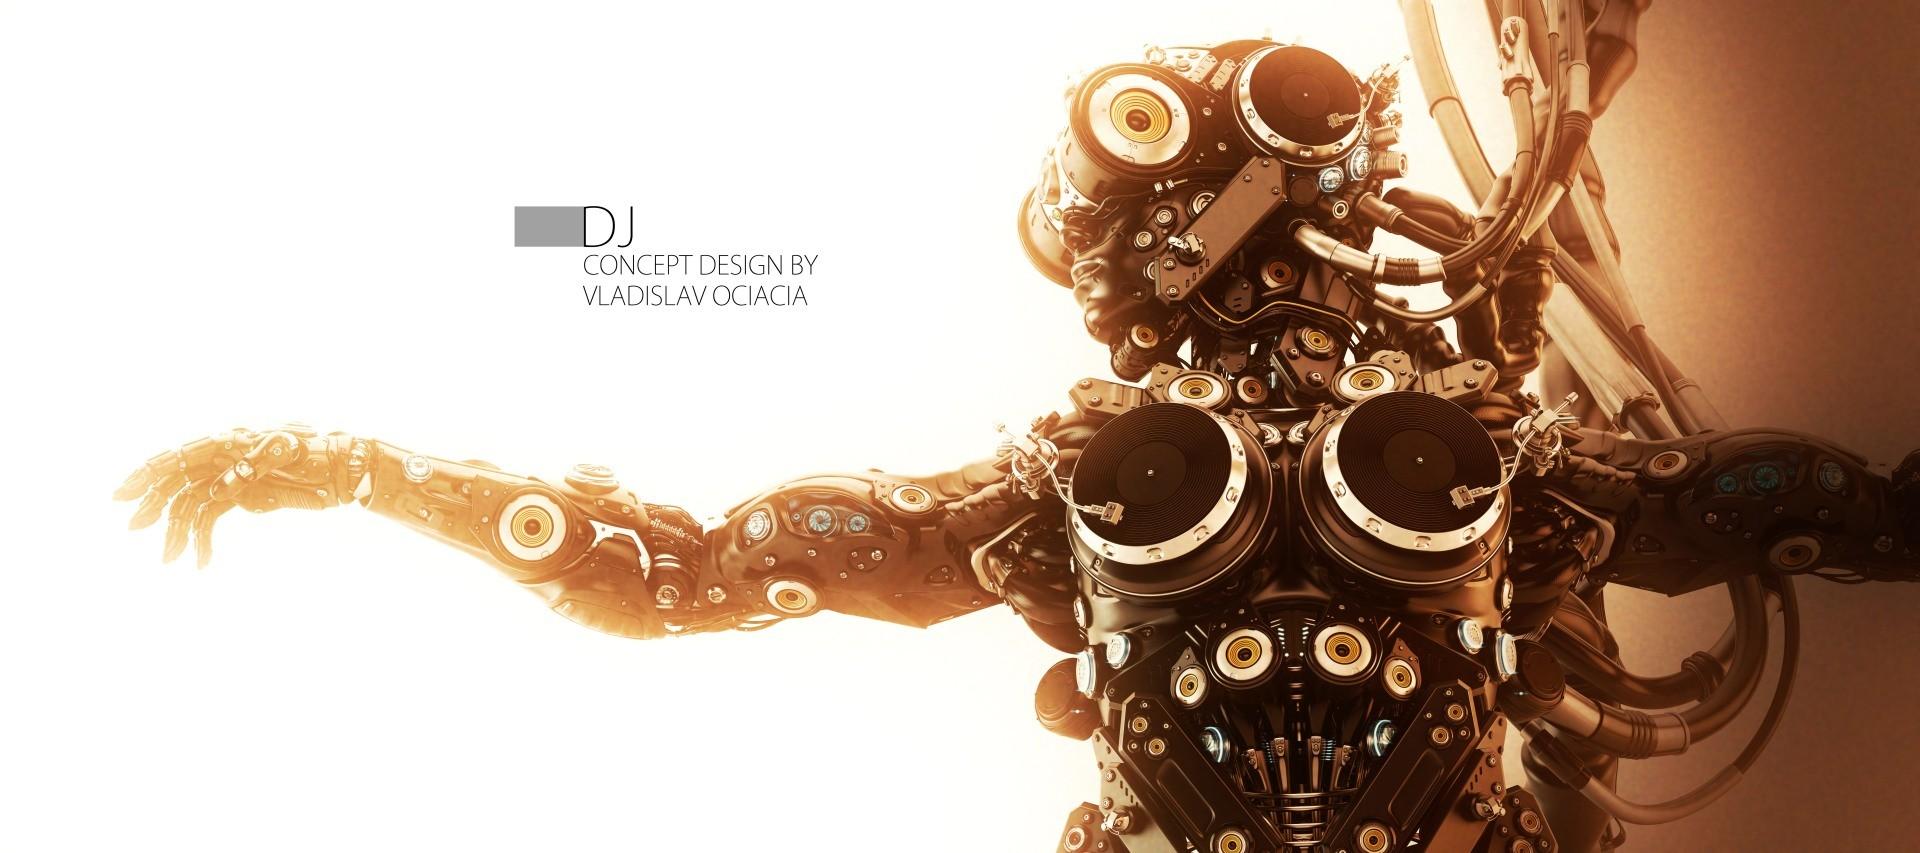 Vladislav ociacia robot dj 10